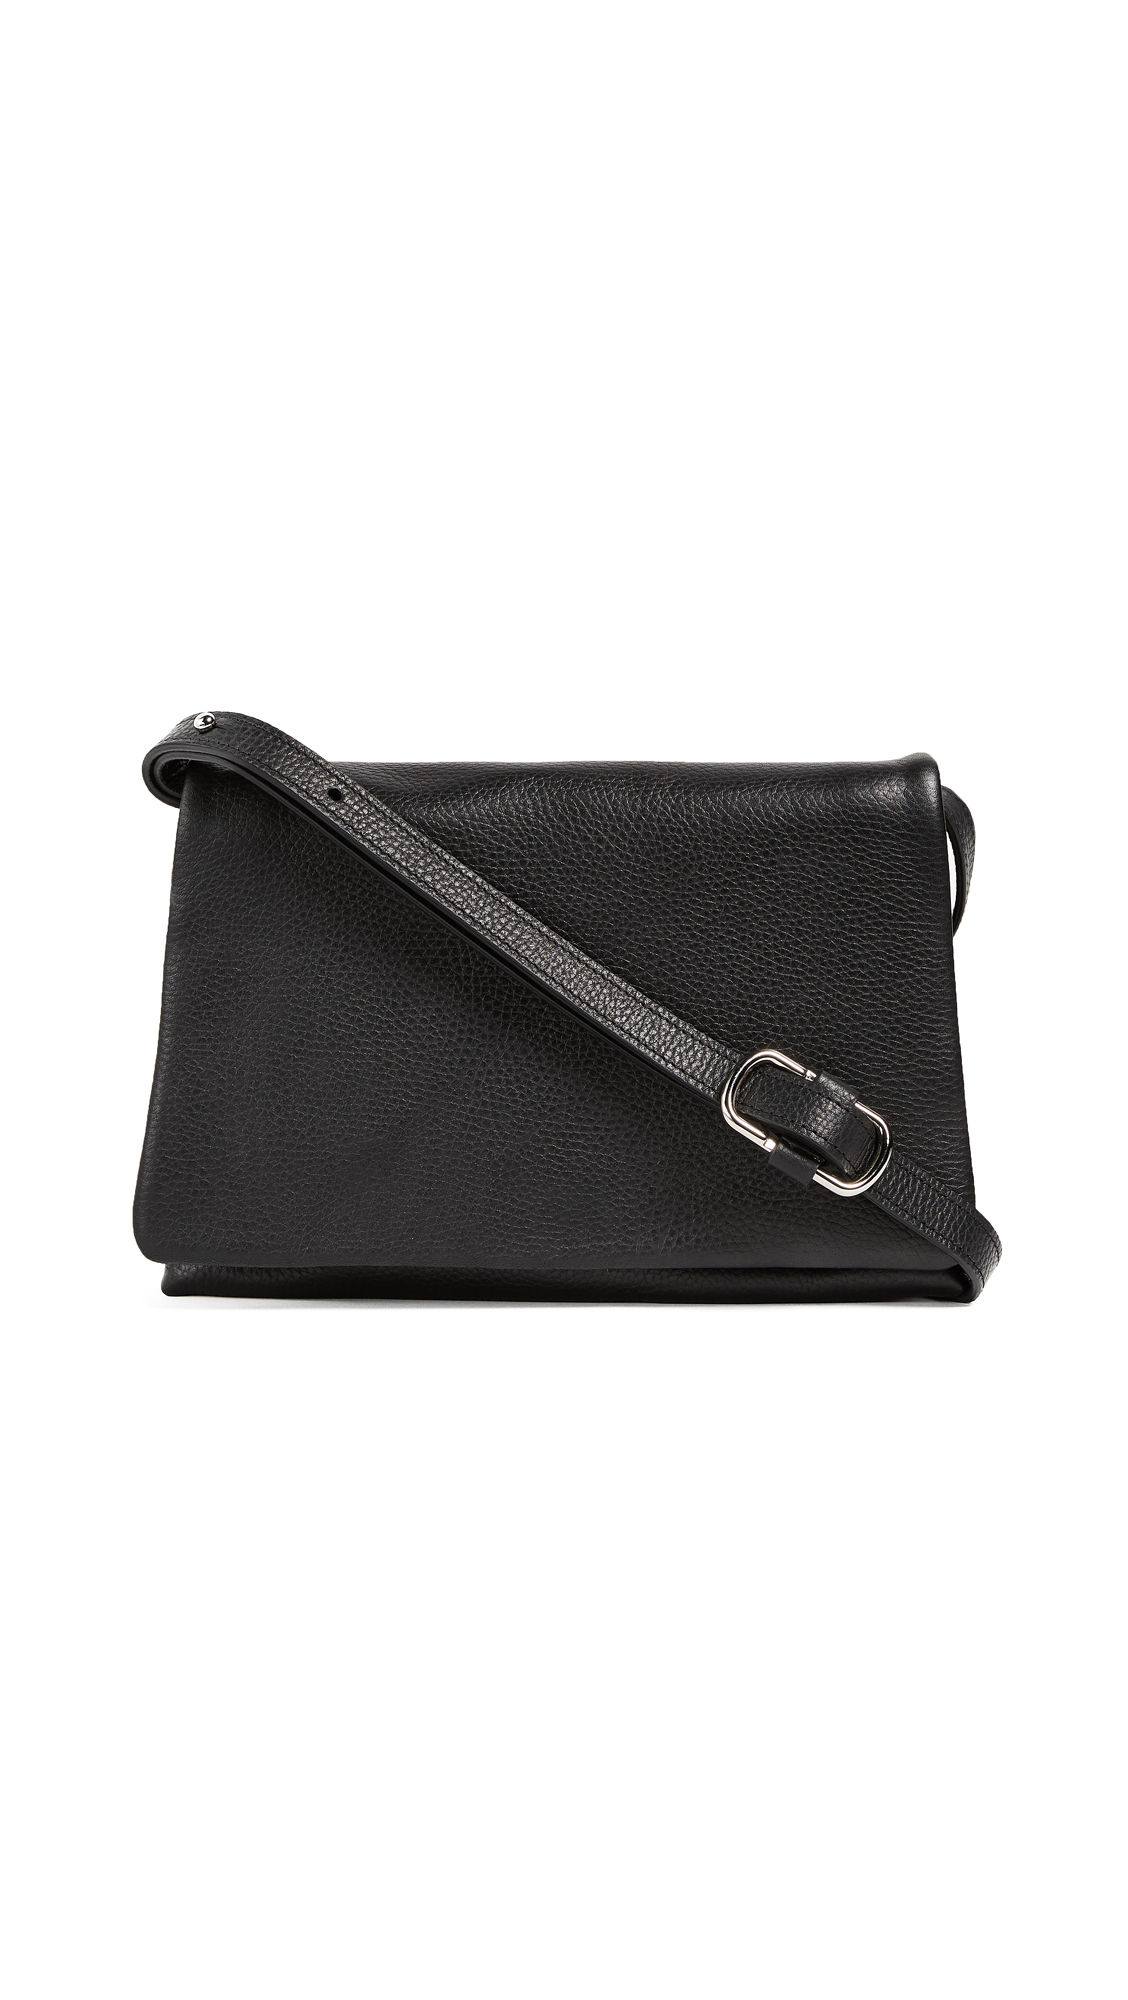 Shinola Rolled Flap Bag - Black